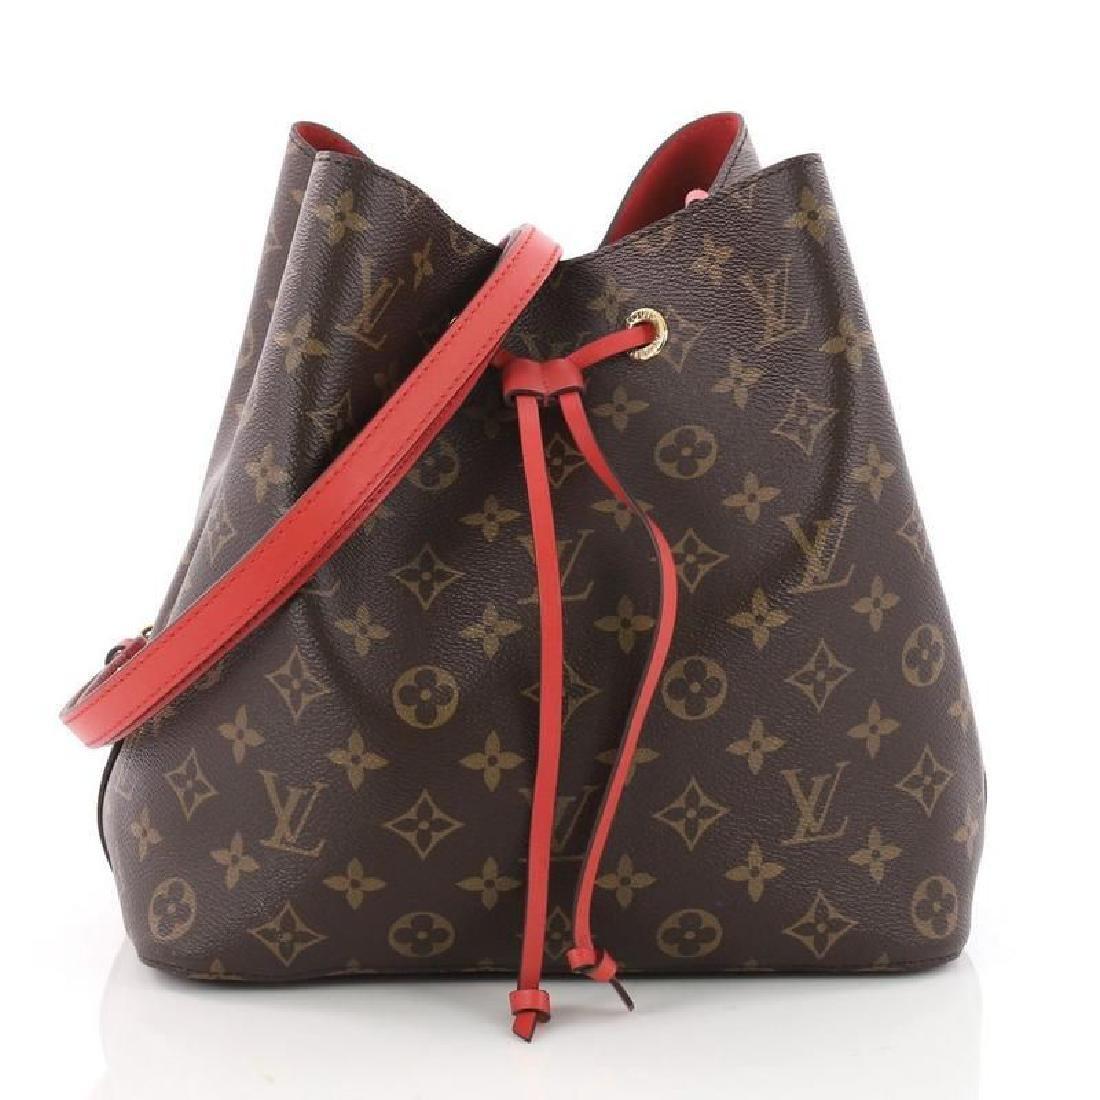 Louis Vuitton Neonoe Monogram Bucket Bag Drawstring